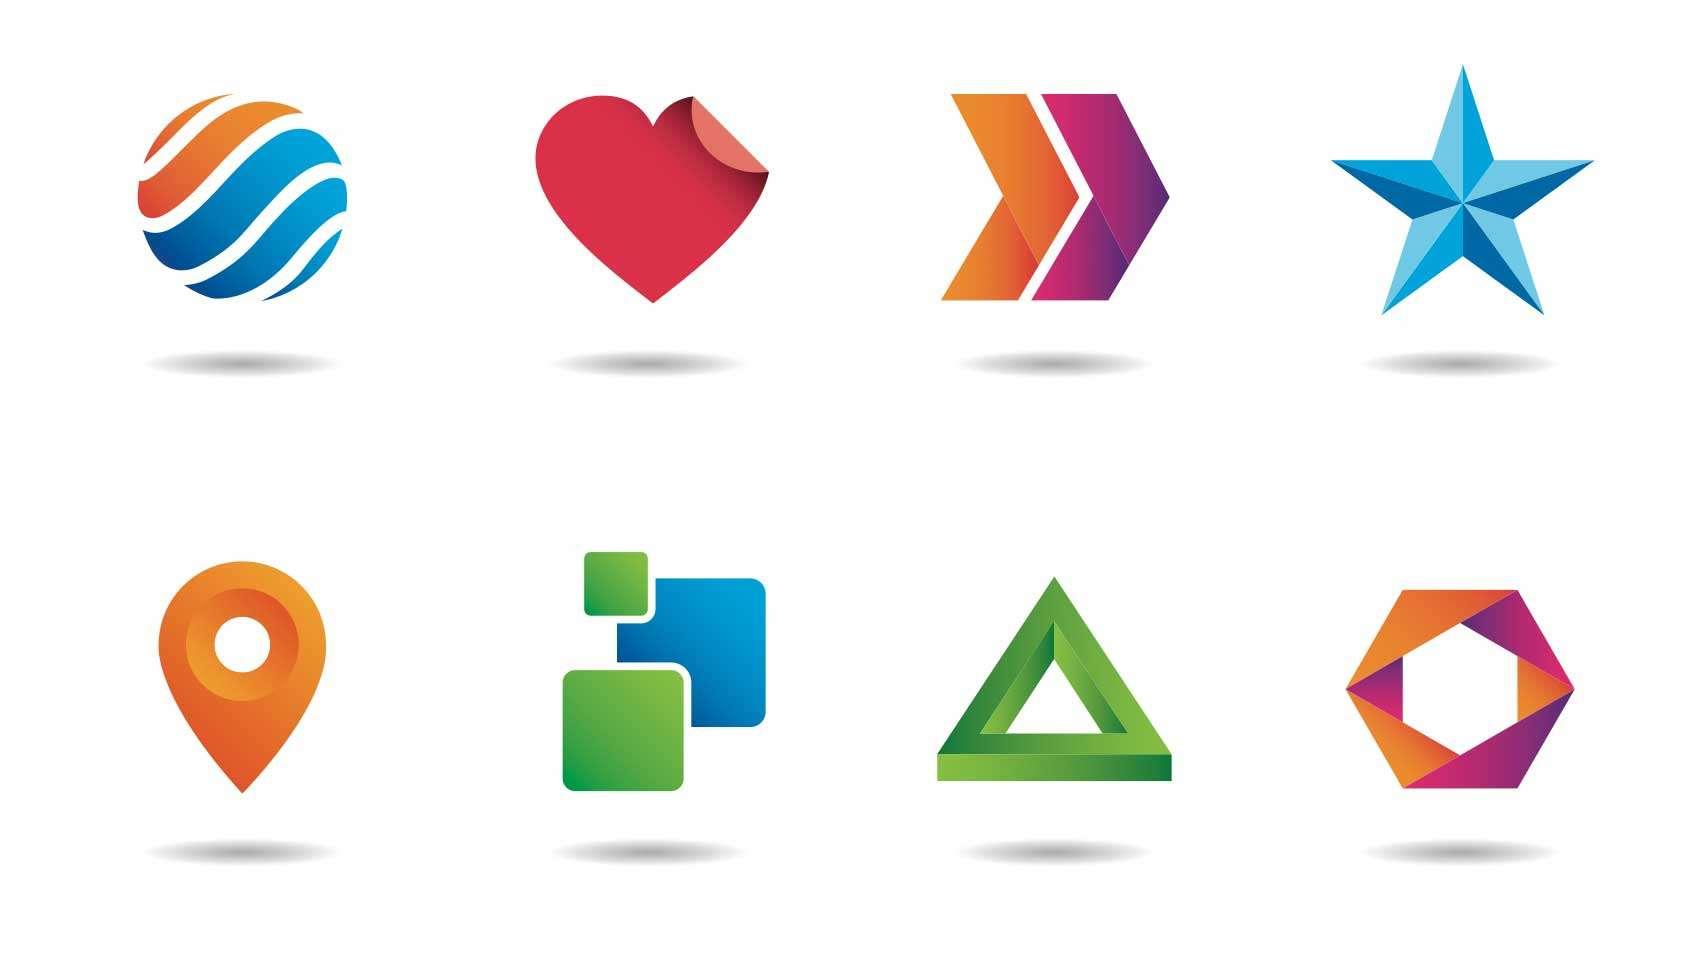 Logo Design Ideas For Graphic Designers A professional logo can